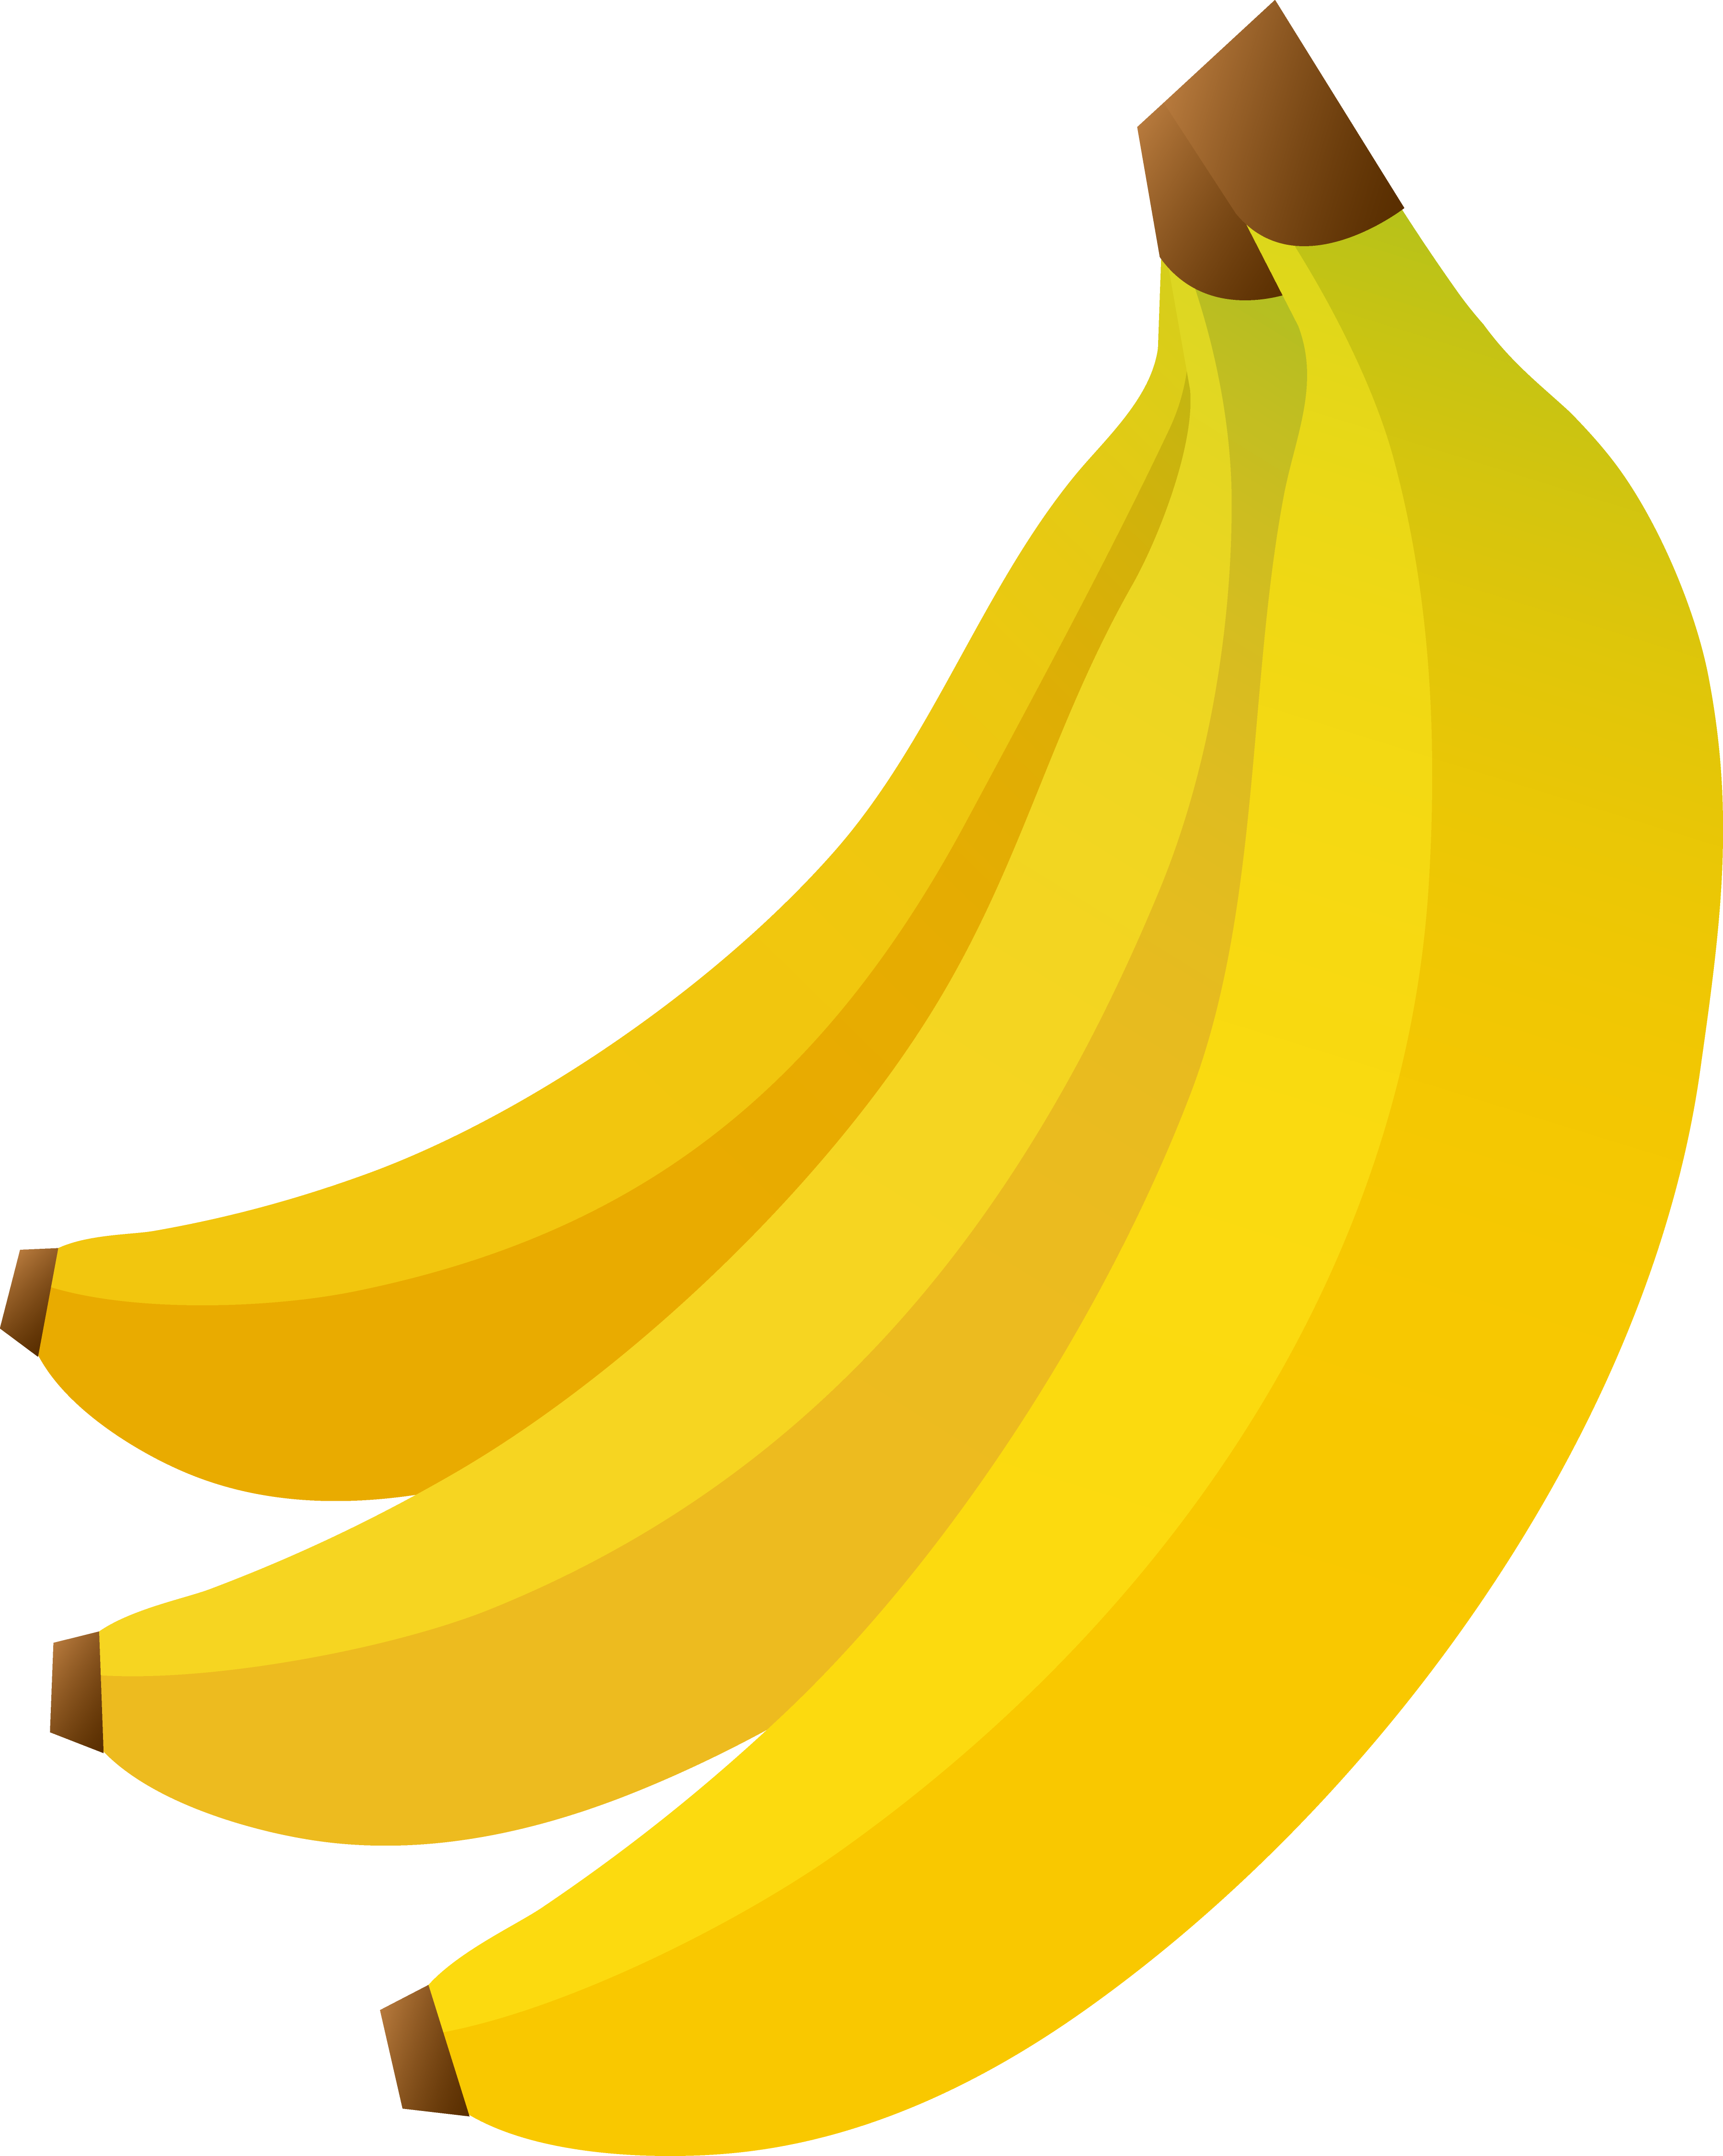 Bunch three bananas.